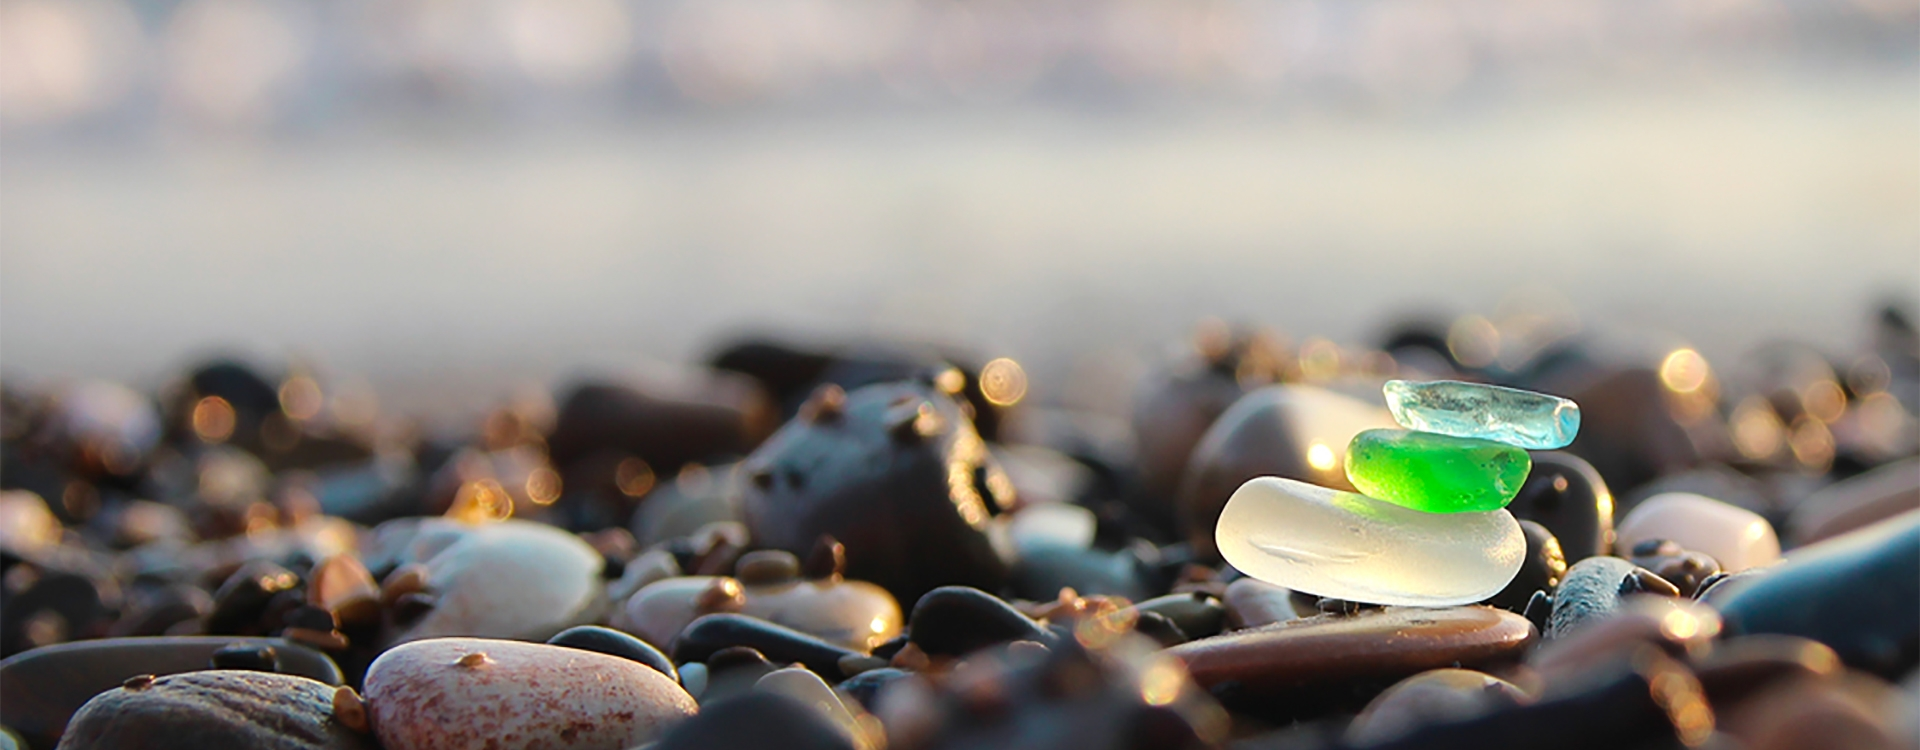 Treasures from trash – sea glass